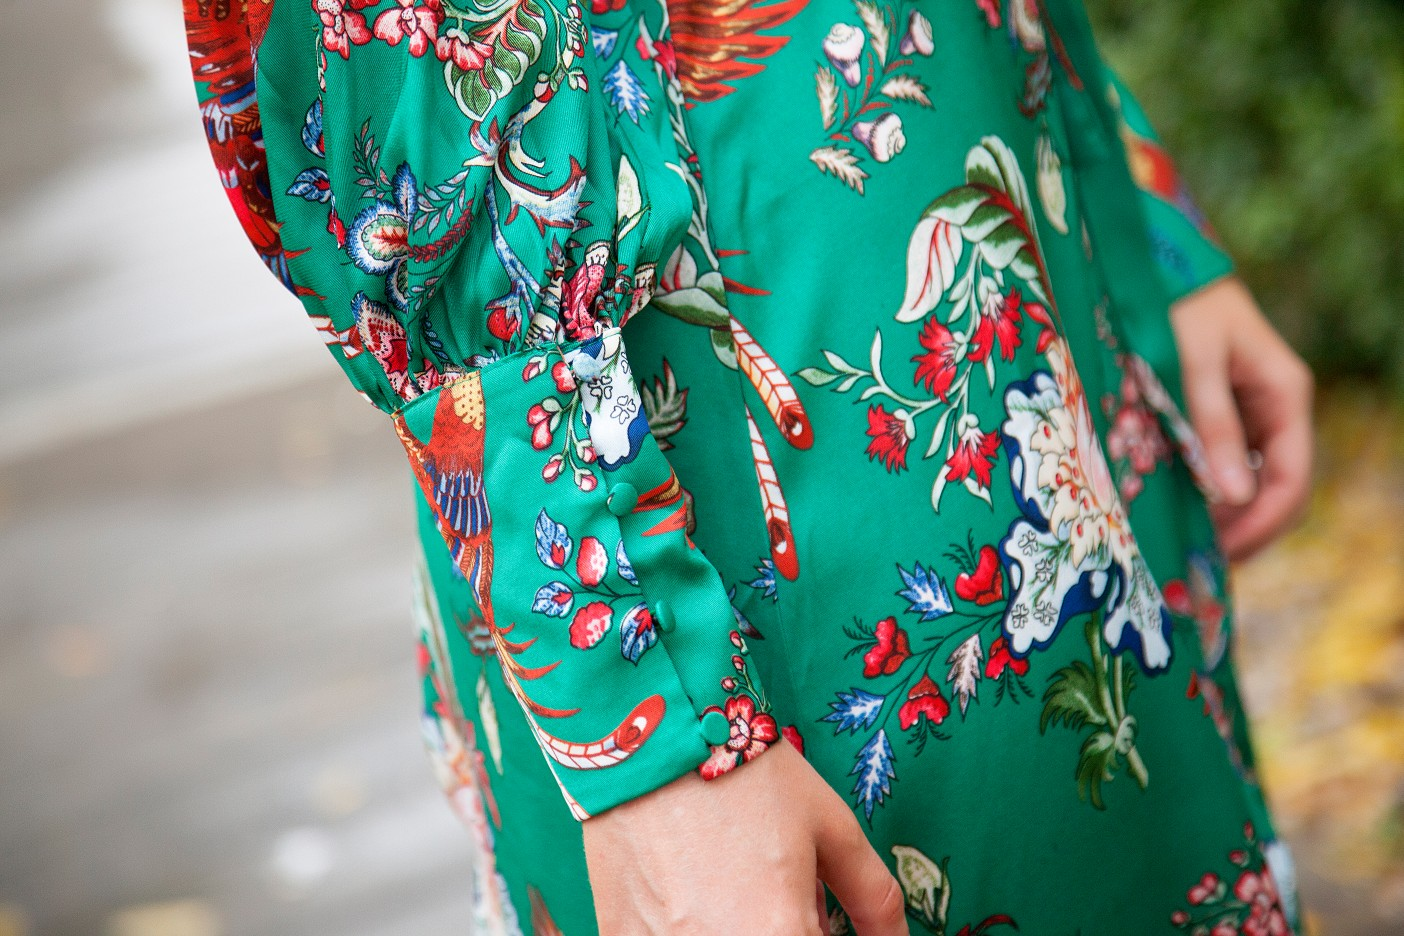 silk pajama print green emerald dress fashion blogger outfit ideas chanel flap handbag lauren slade style elixir 7